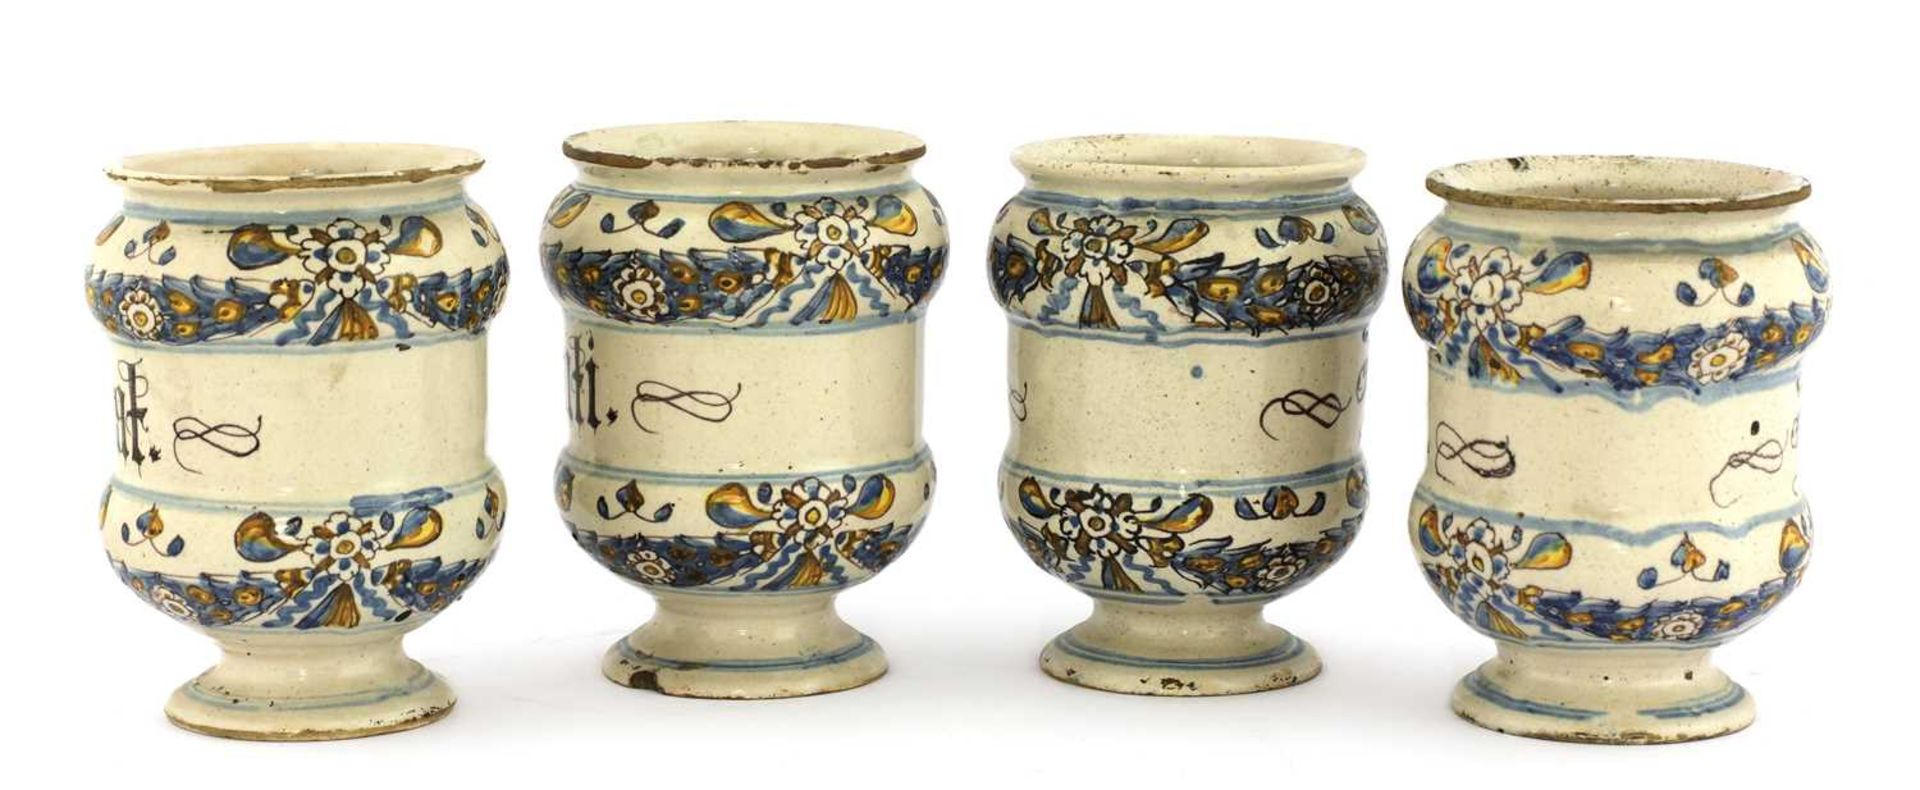 A set of four Italian majolica apothecary jars, - Image 2 of 4